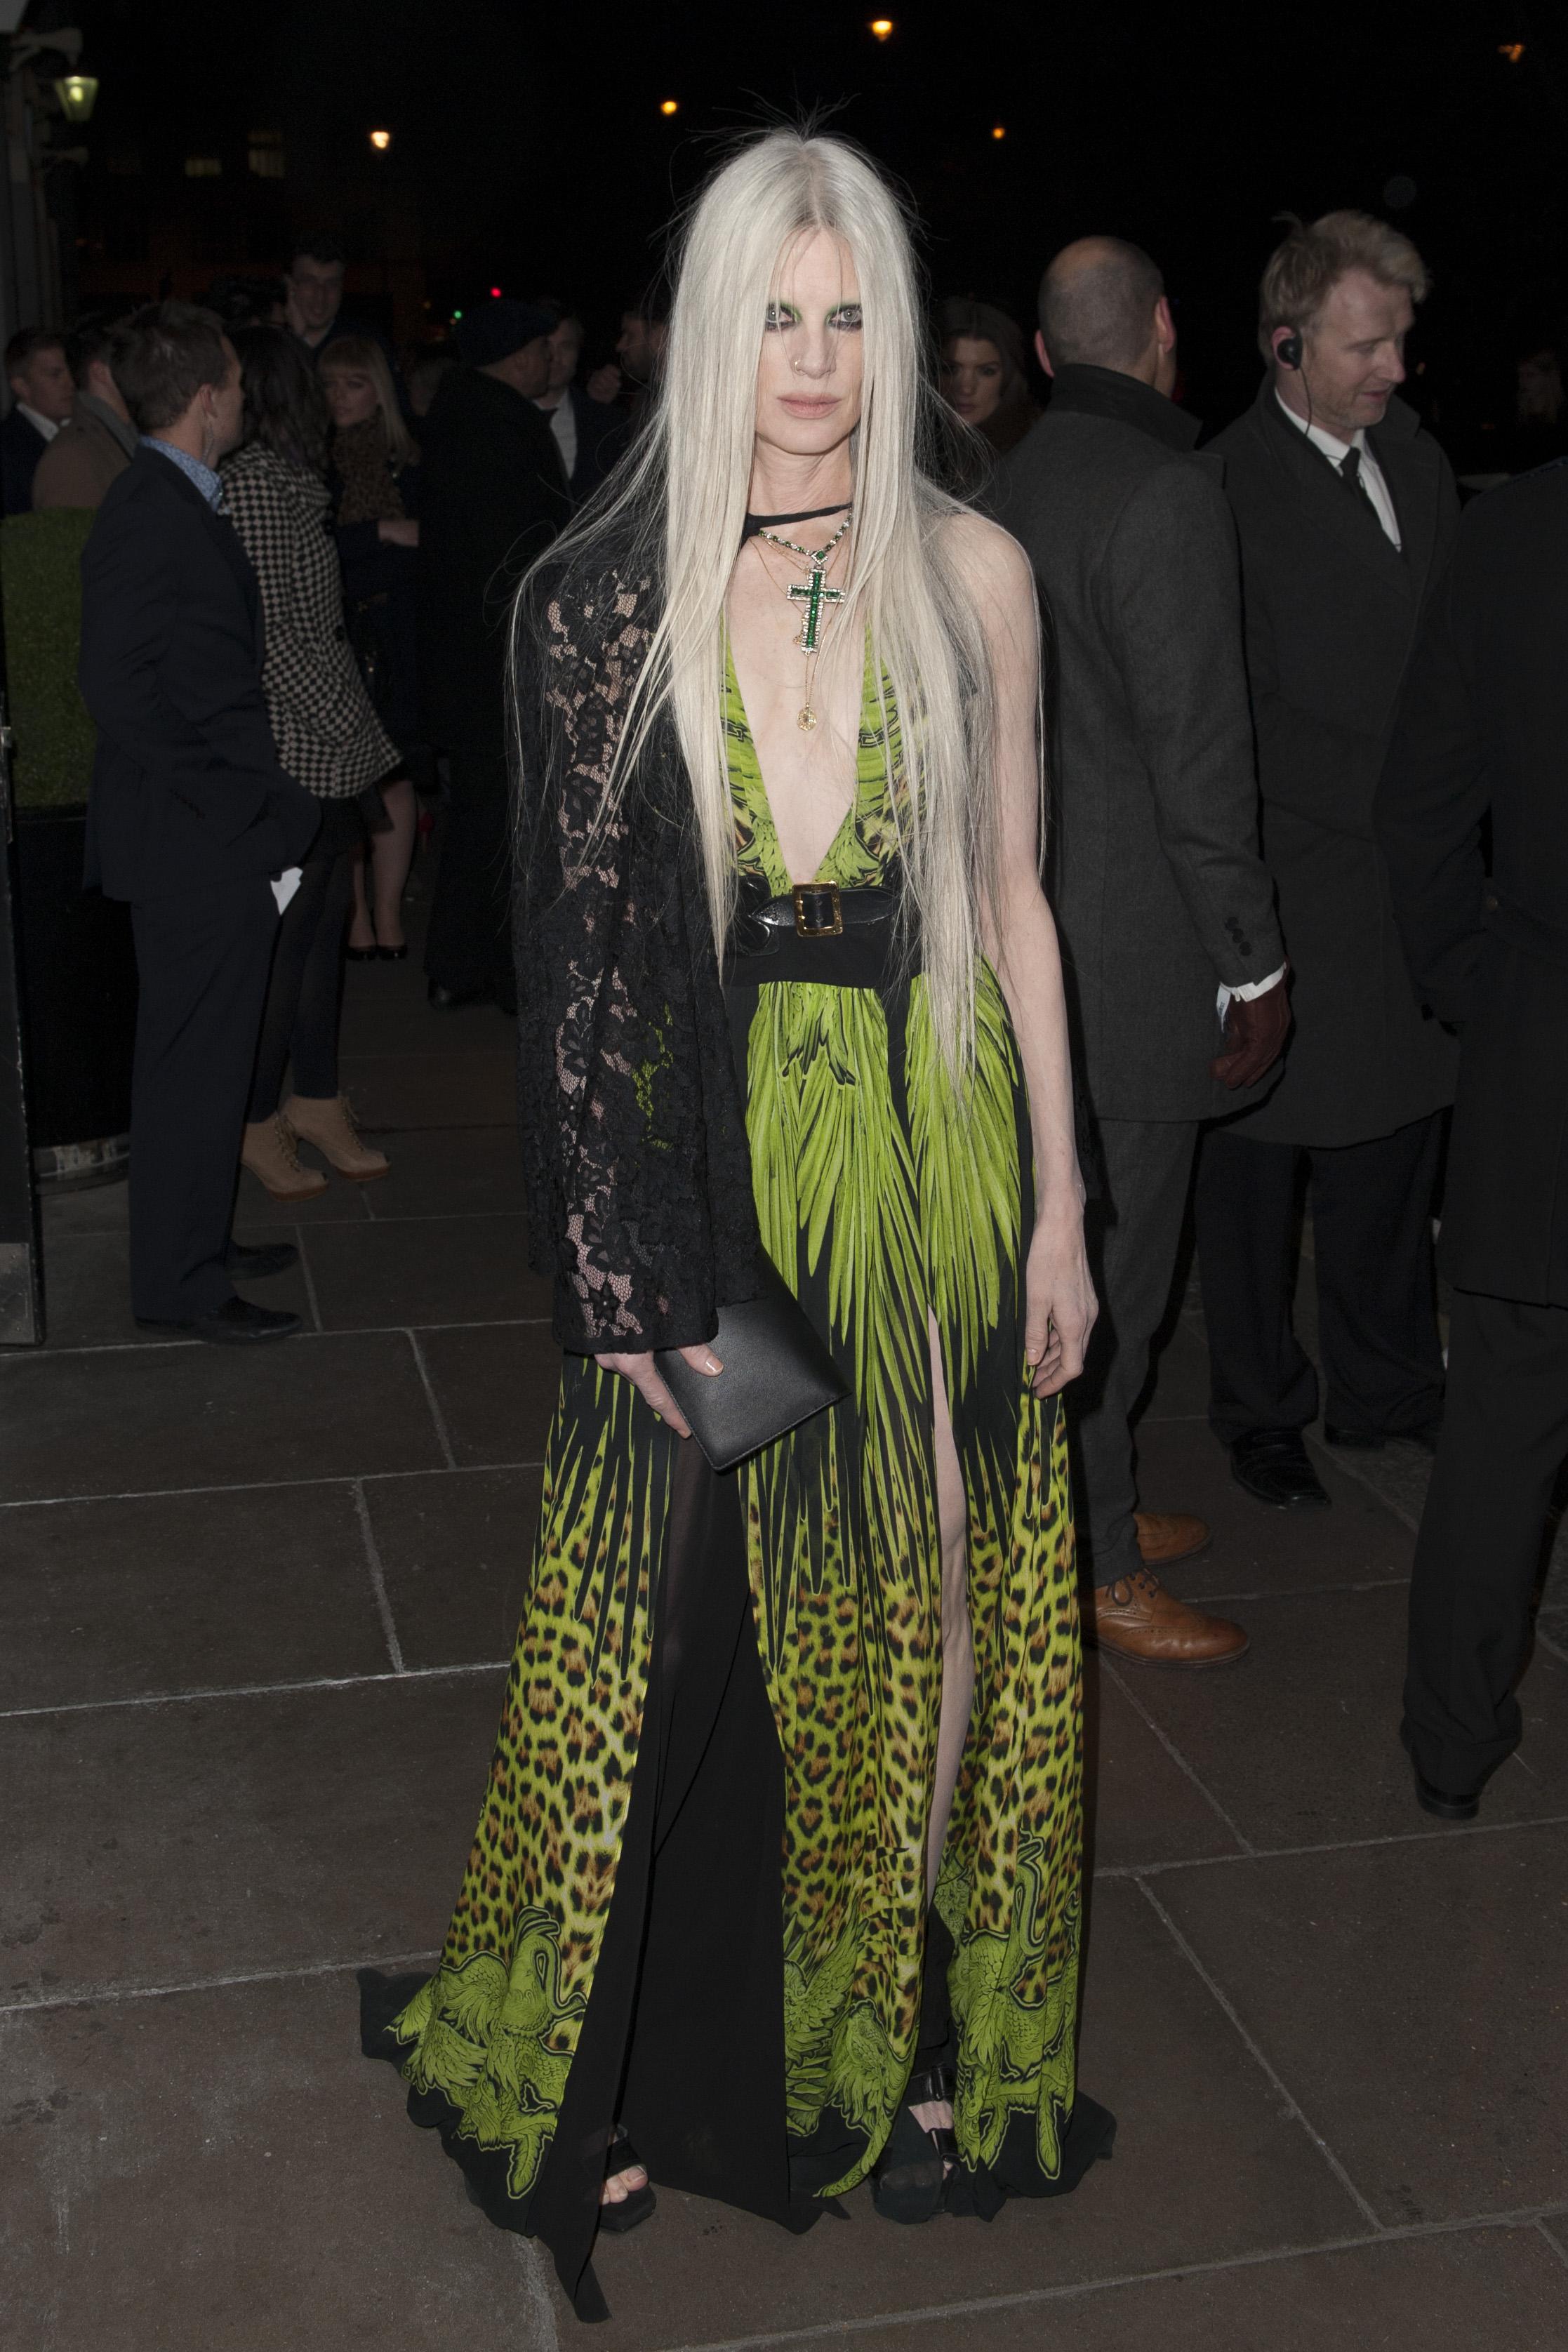 Kristen McMenamy at the Brit Awards in London.